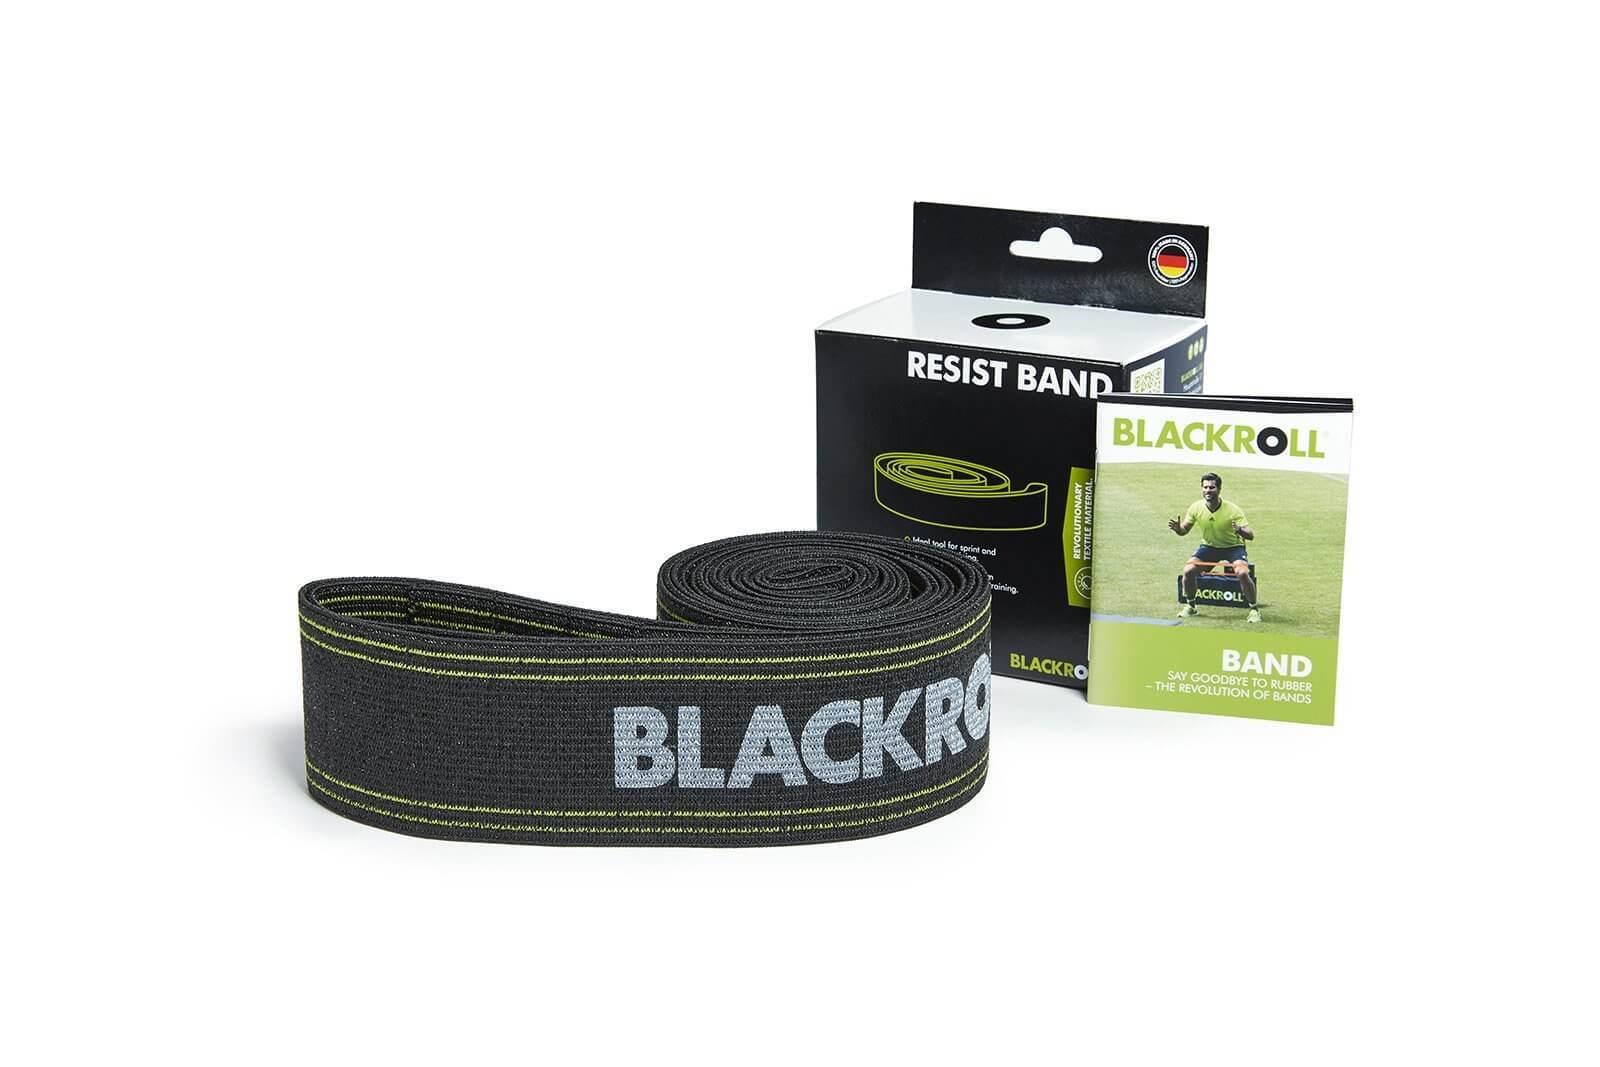 Оборудование BLACKROLL® для тренинга Эспандер-лента текстильная BLACKROLL® RESIST BAND 190 см (сверхтяжелое сопротивление, черная) BLACKROLL_white_small_0089_Sebastian_Schoffel_465b080a-6b90-4e6a-8058-9dd65c5660a7.jpg